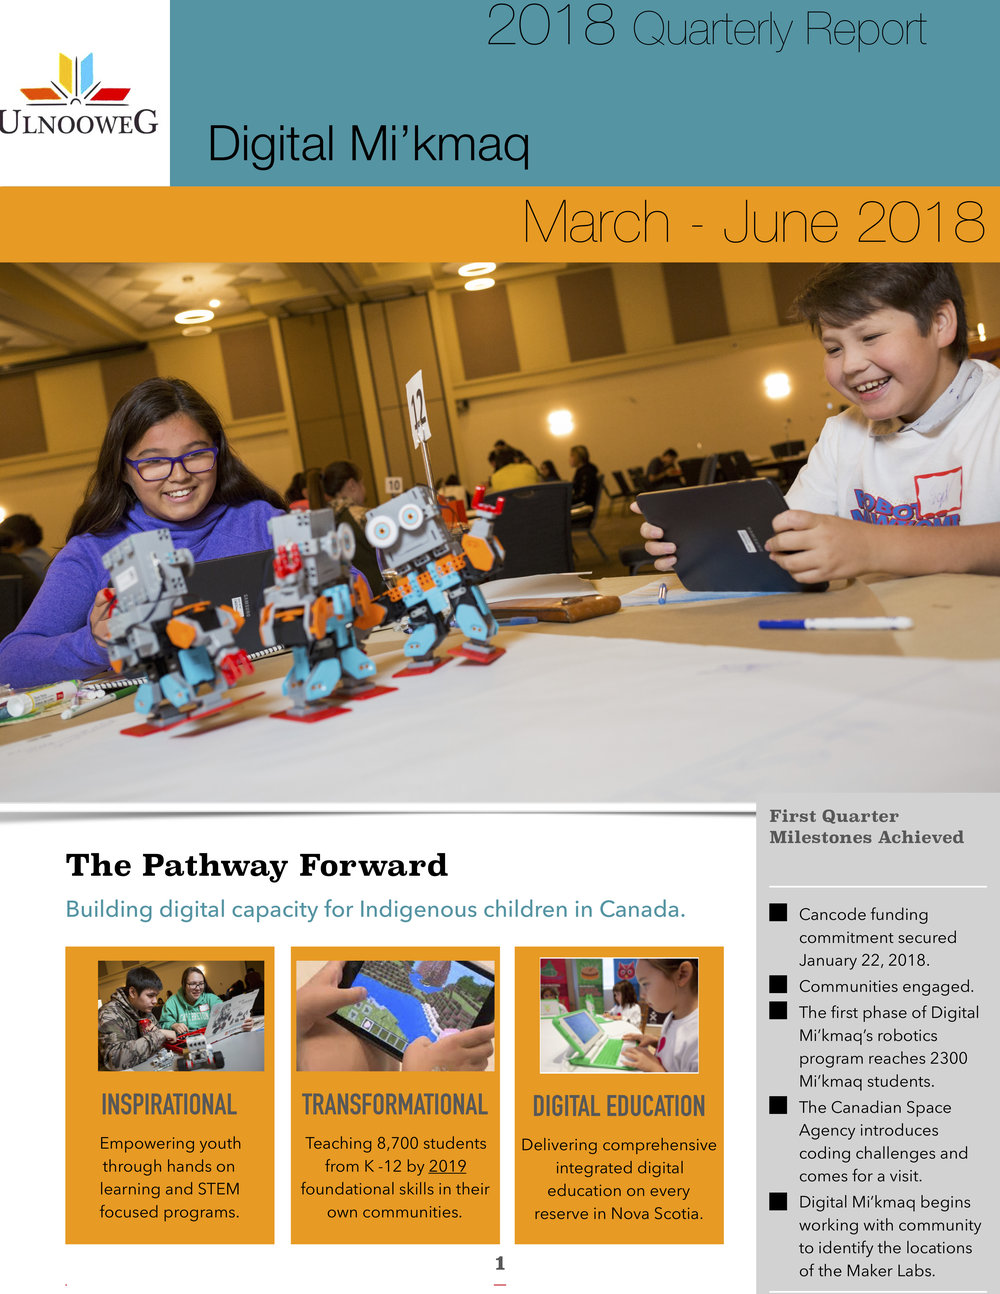 March-June 2018 Quarterly Report